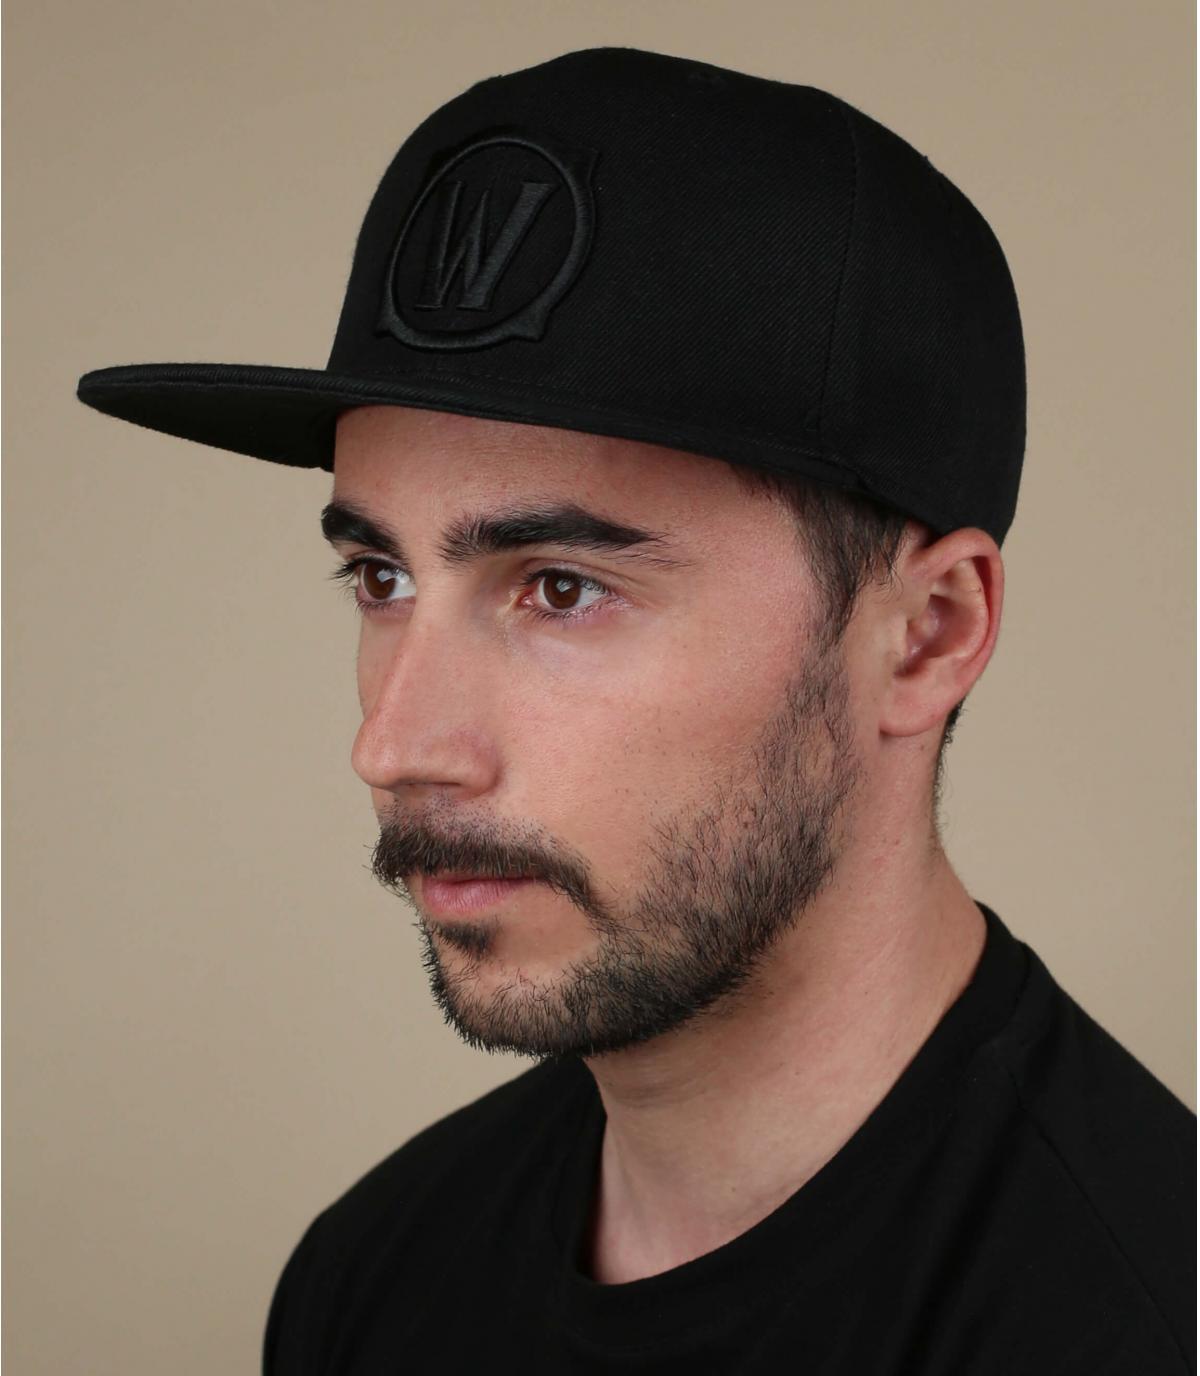 Warcraft cap